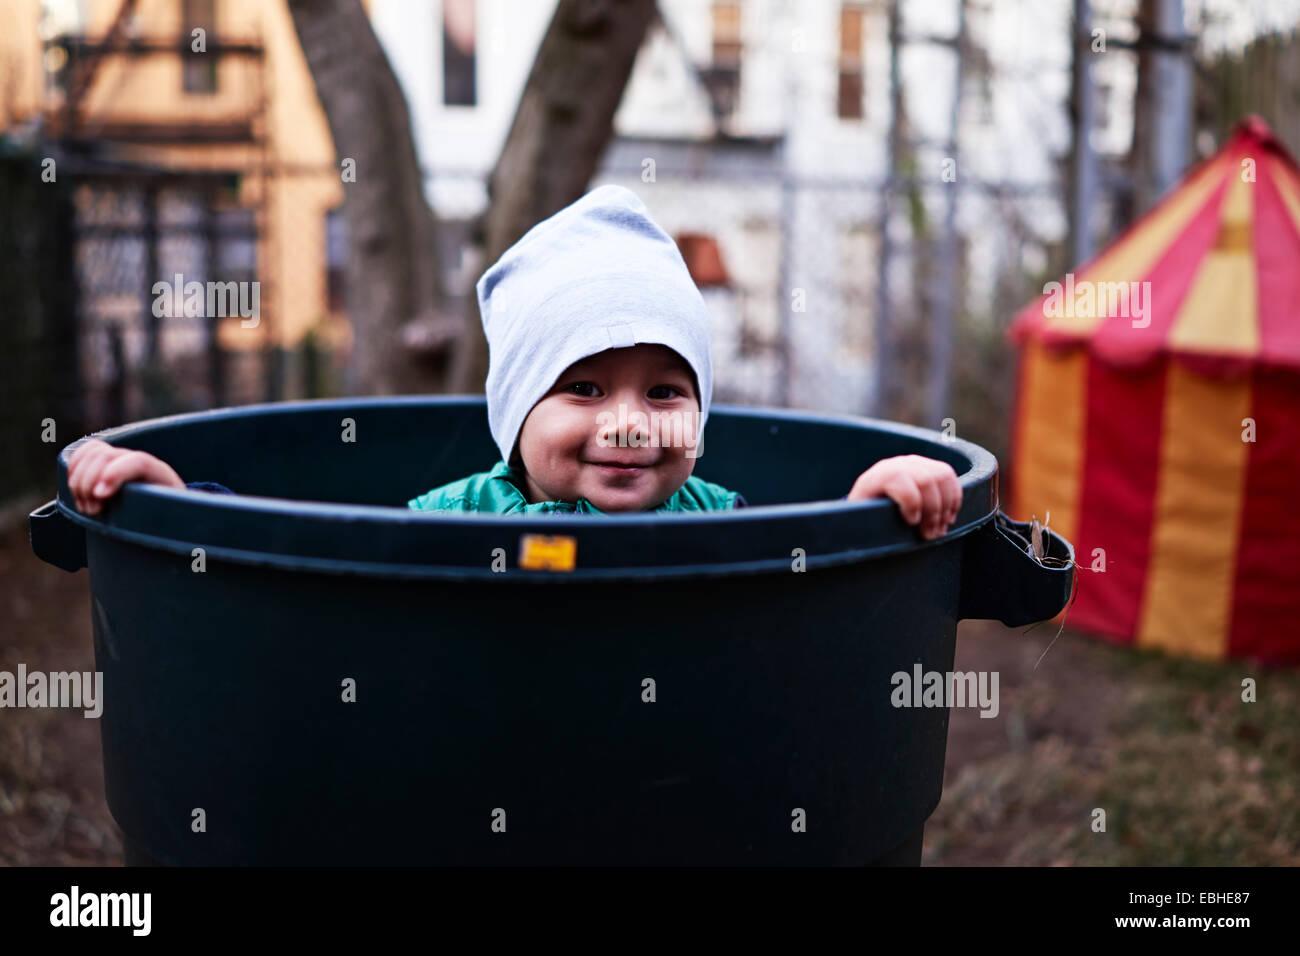 Junge in Wanne, Brooklyn, New York, USA Stockbild